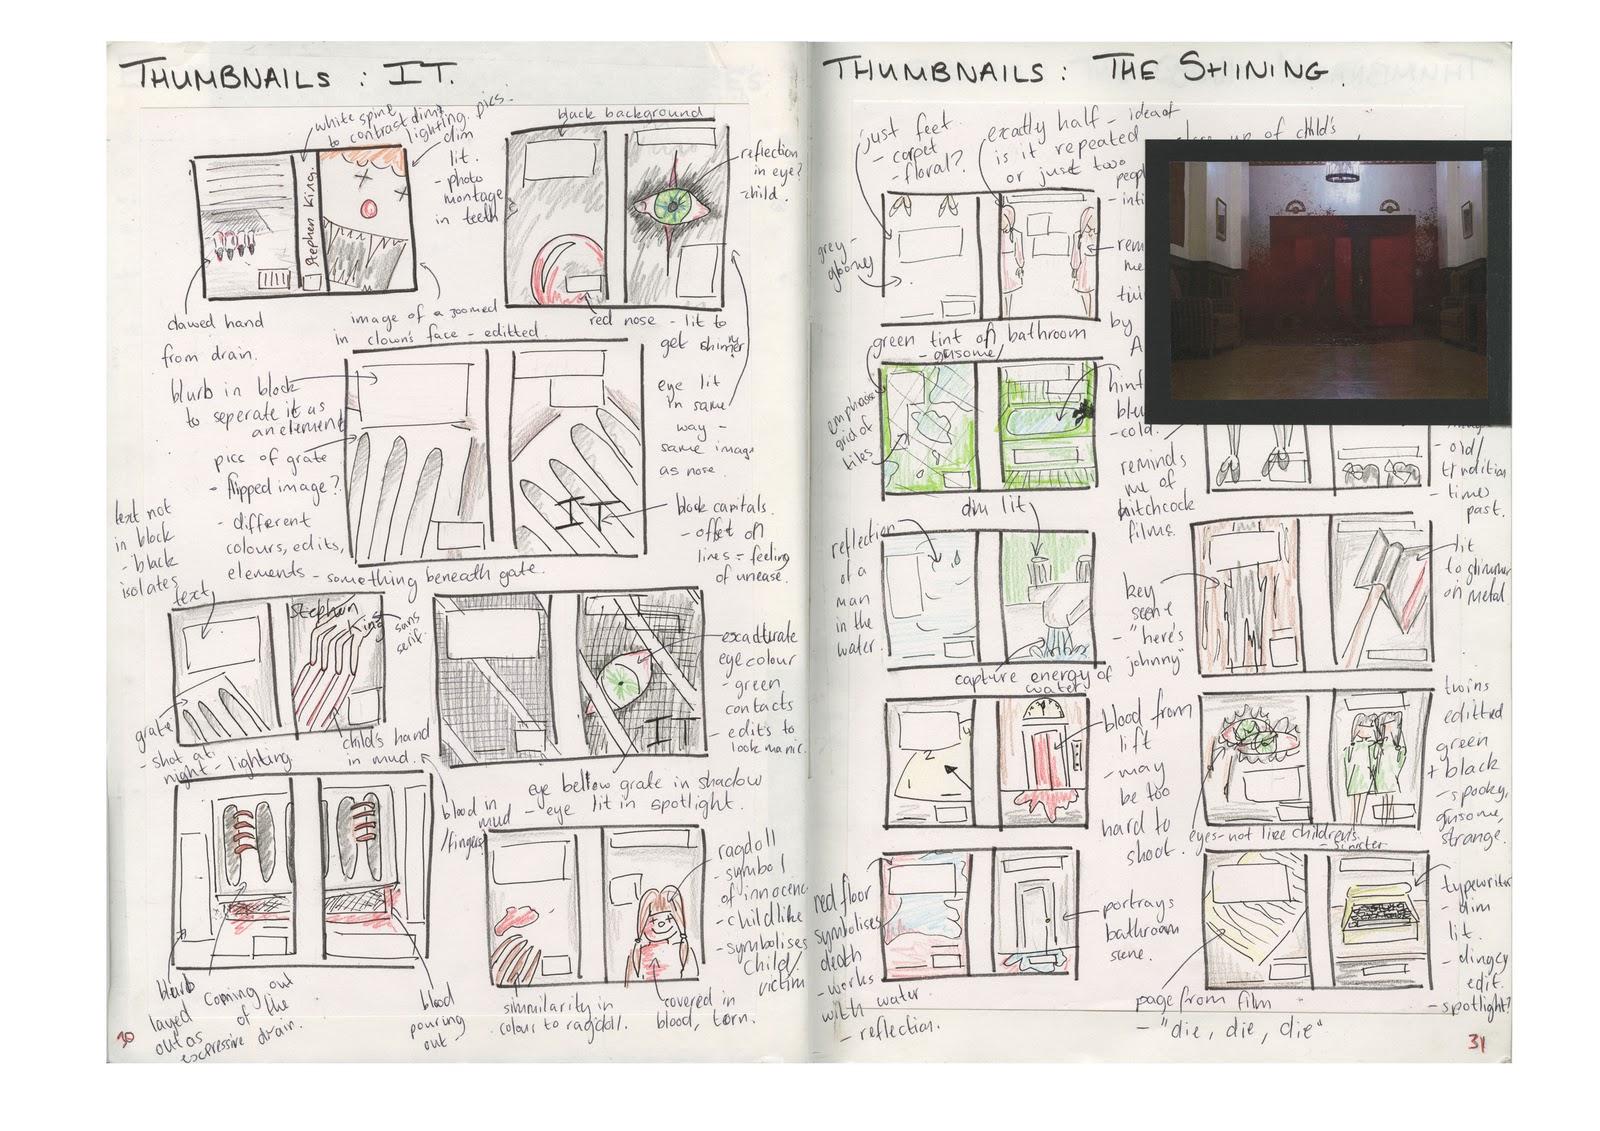 Thumbnail Sketch Examples Use Thumbnail Sketches And